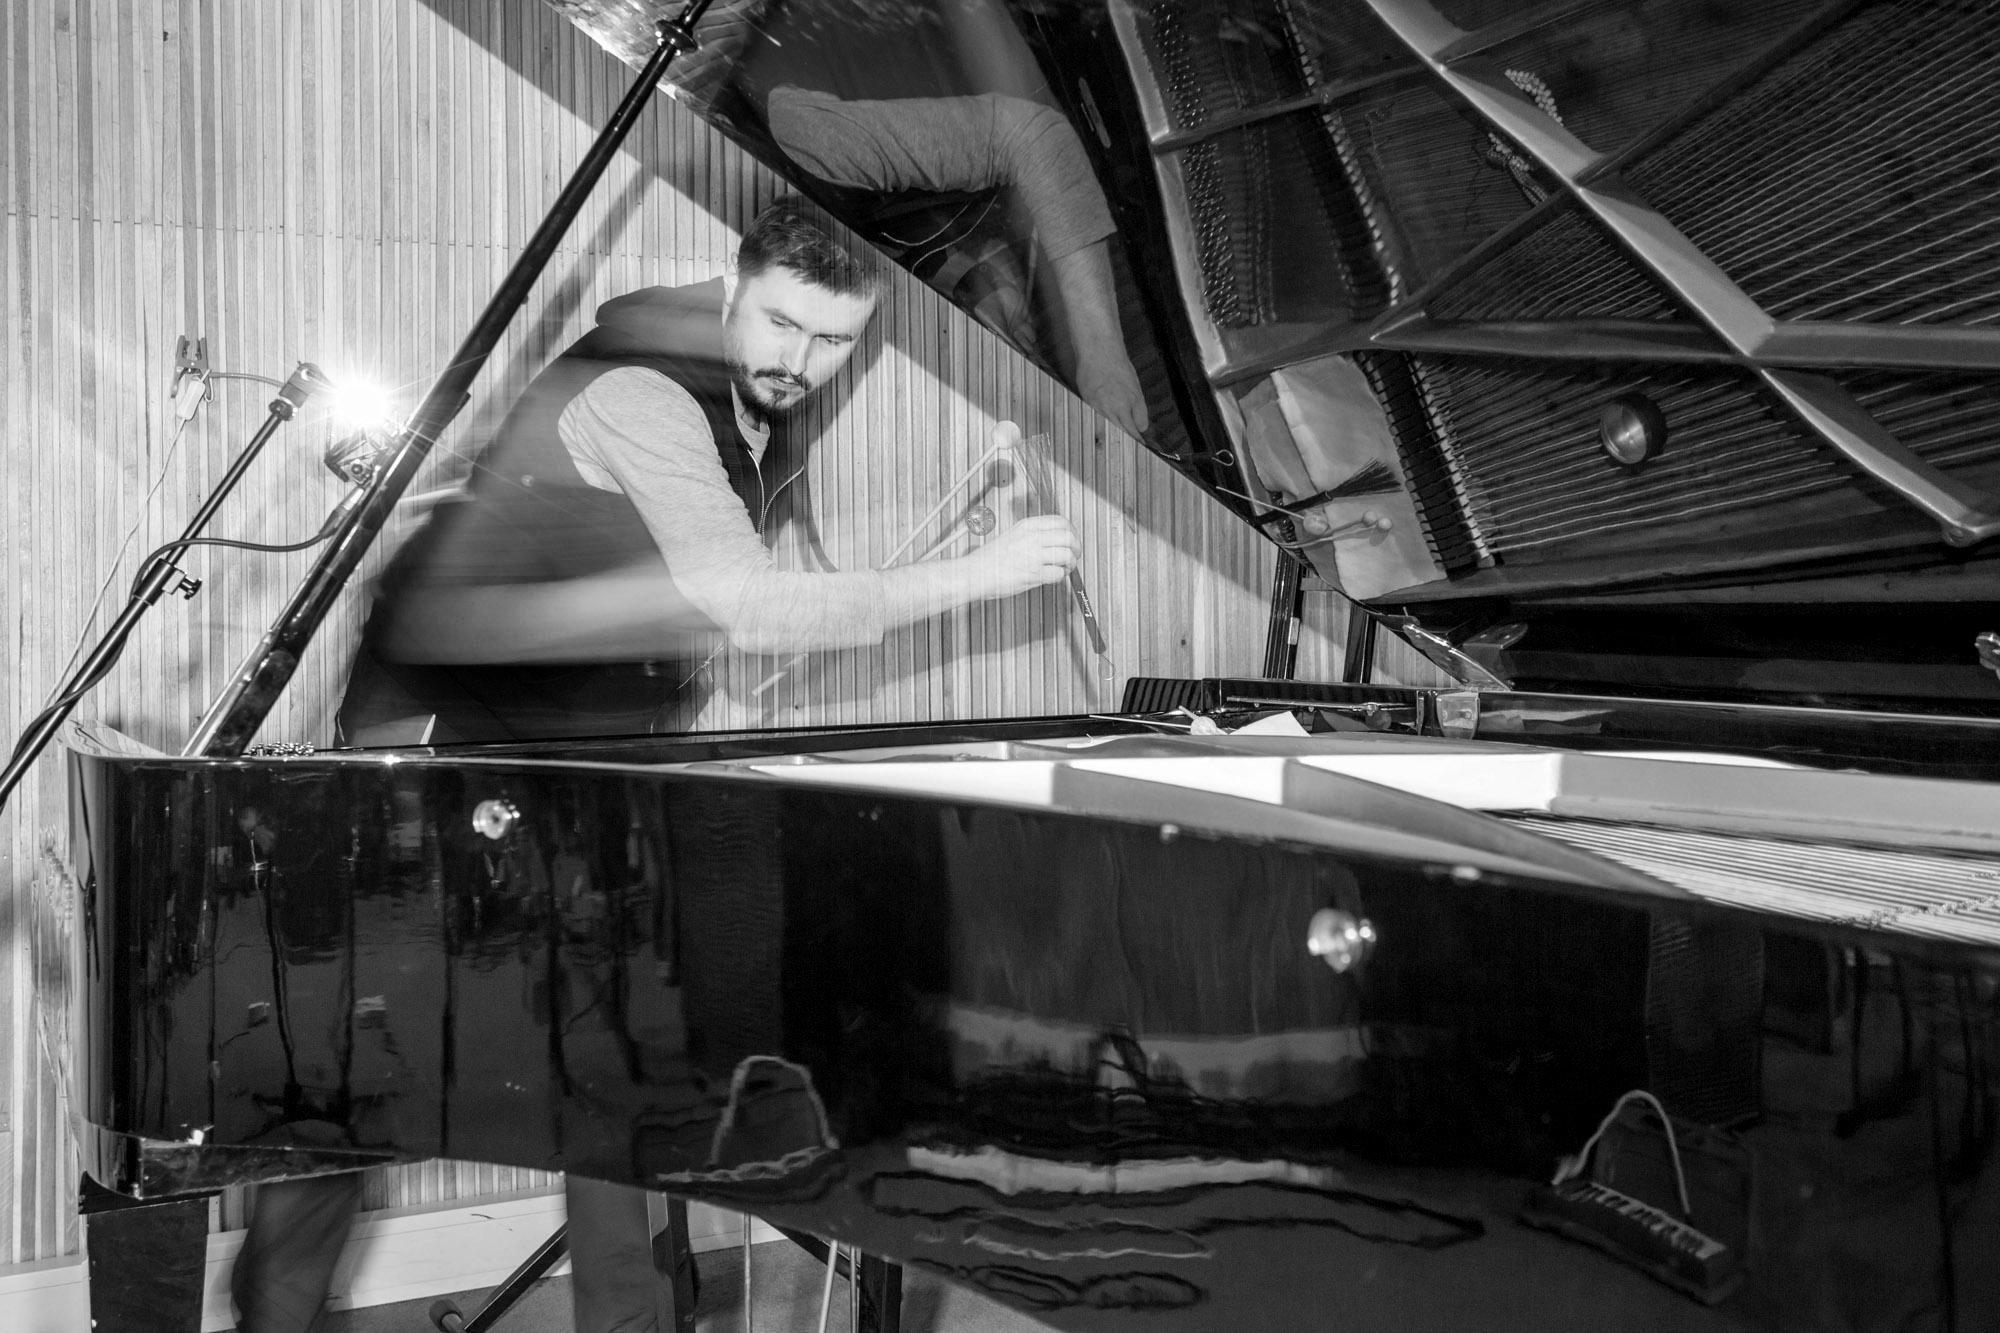 Mammoth Ulthana – Jacek Doroszenko and Rafał Kołacki, Particular Factors – recording session, Quality Studio, Warszawa